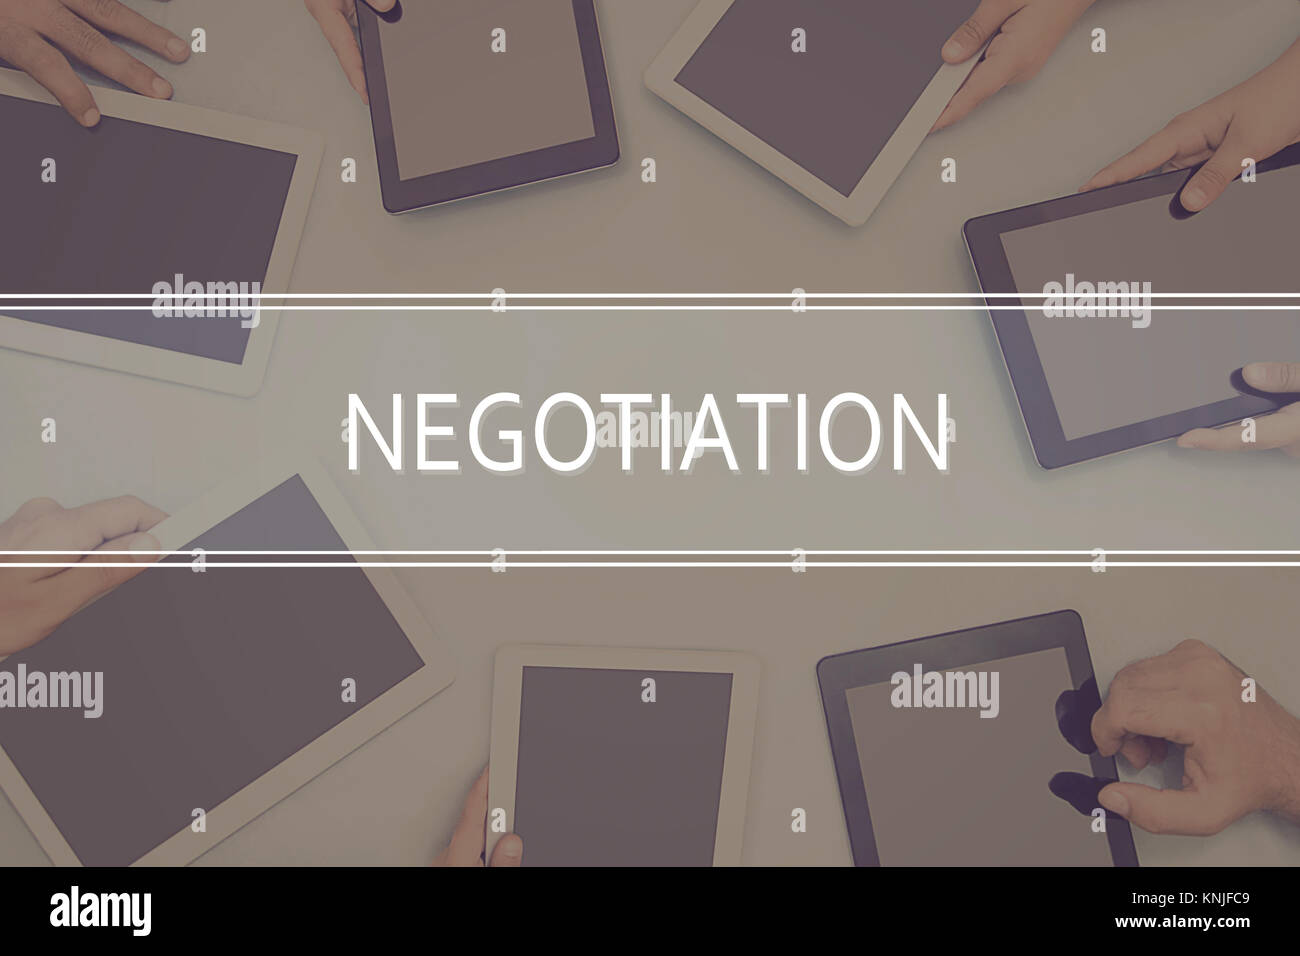 NEGOTIATION CONCEPT Business Concept. - Stock Image